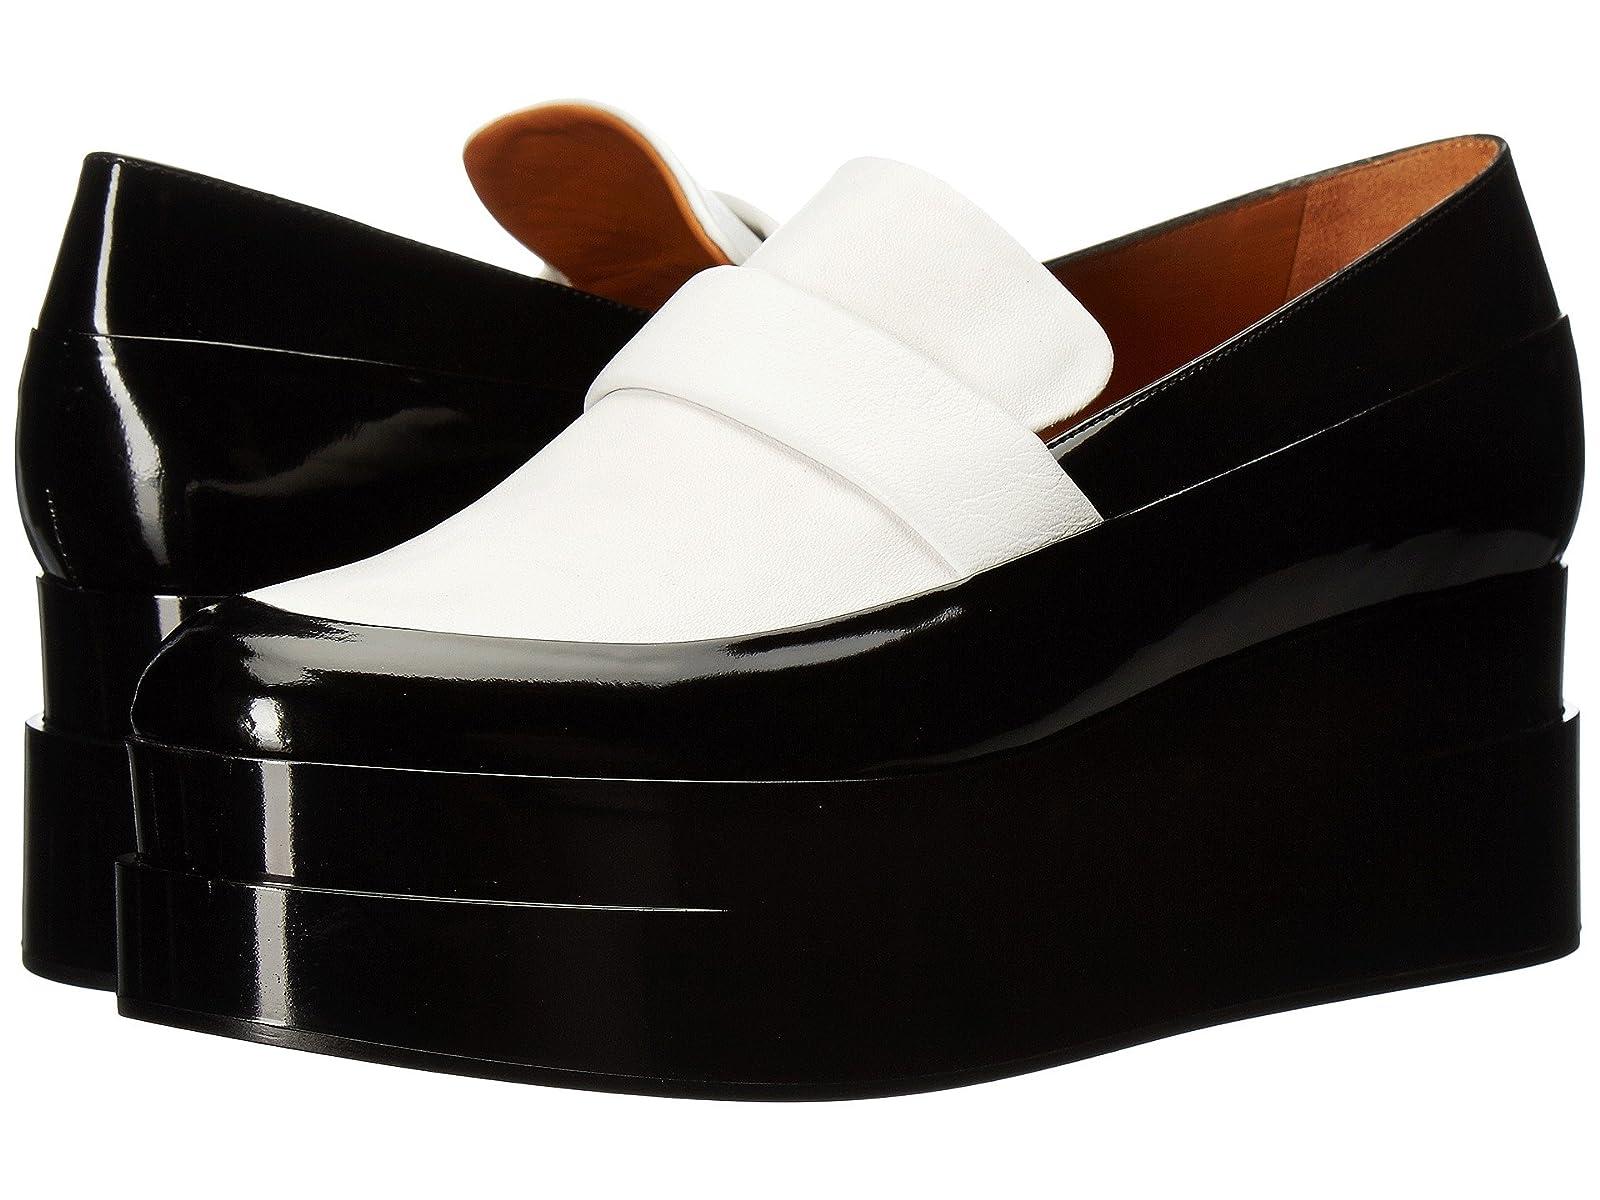 Clergerie LynnAtmospheric grades have affordable shoes